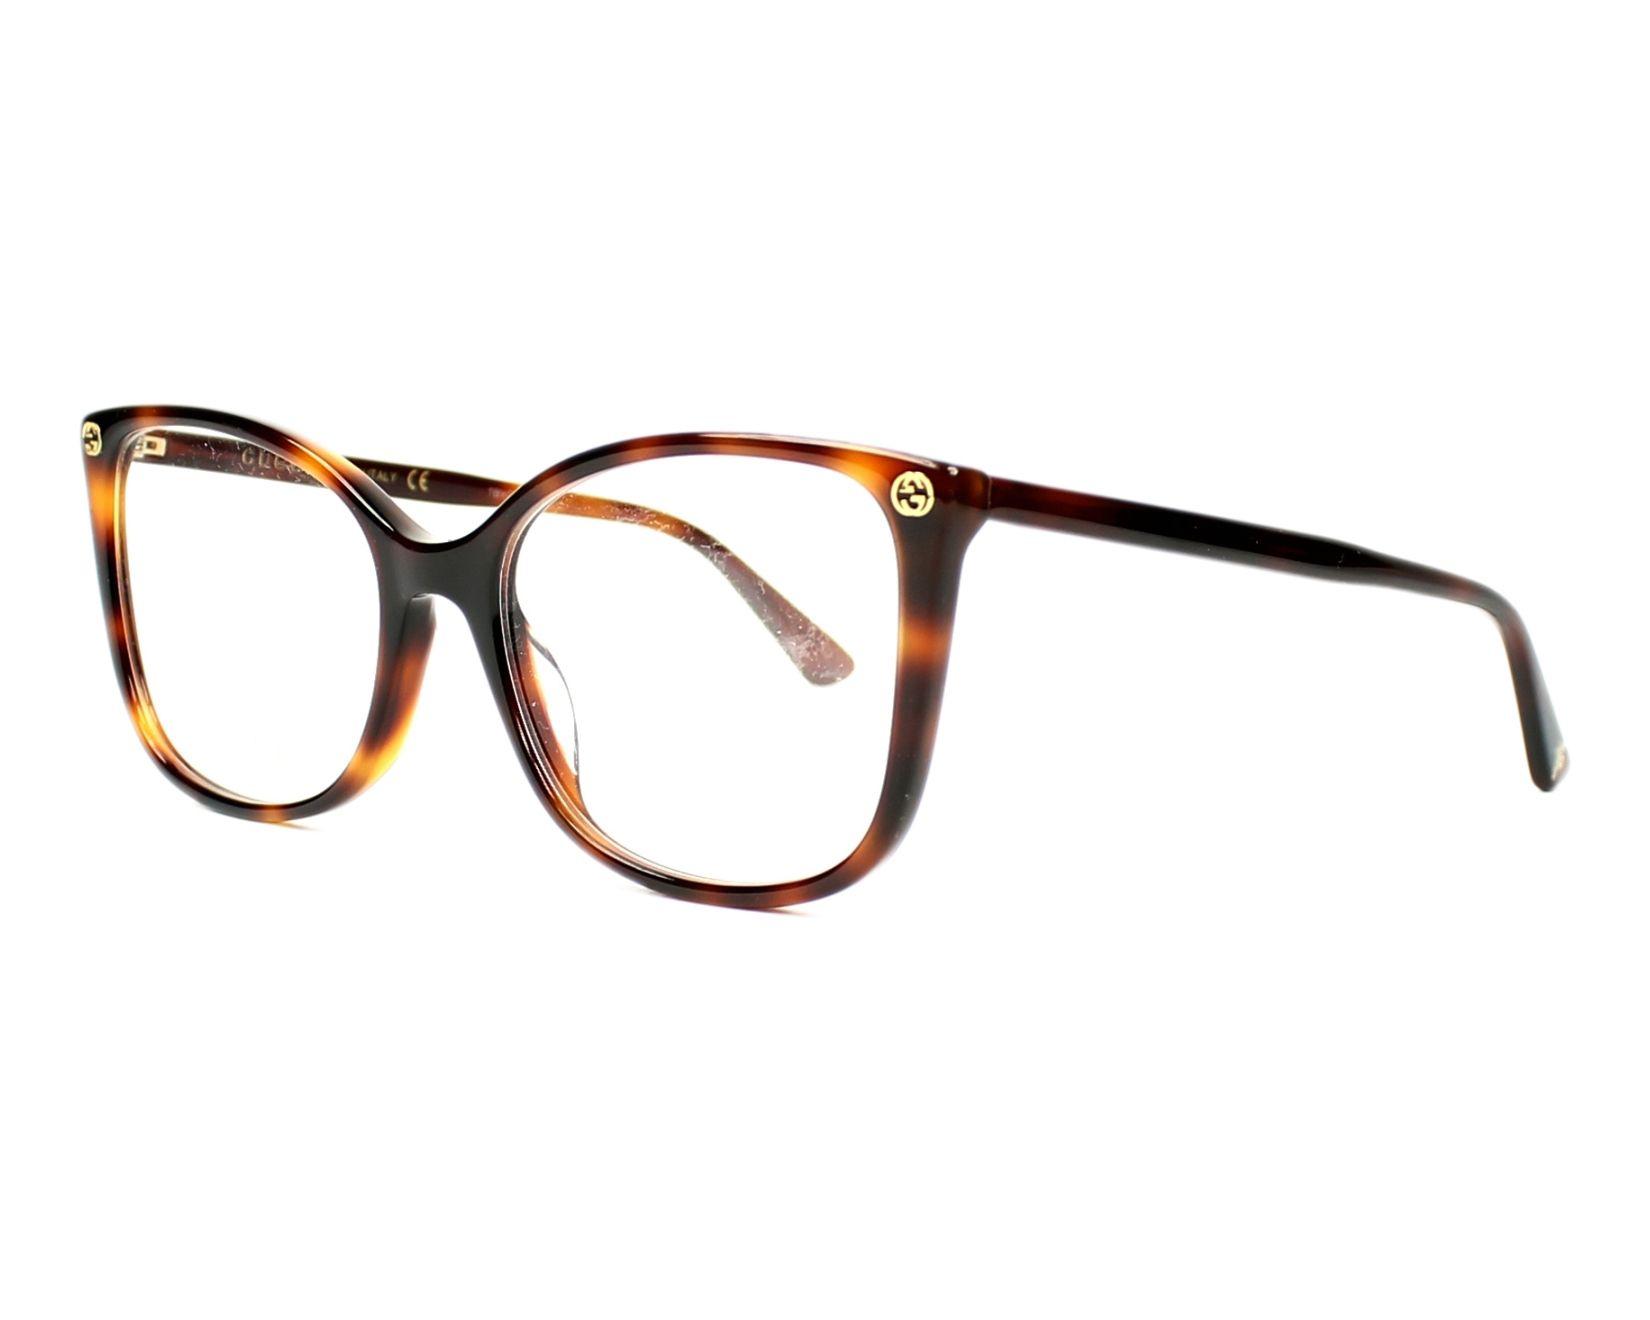 Po inProductFL likewise Carrera 5003st Dl5z9 besides Haces Un Buen Uso De Las Lentillas additionally Keratoconus in addition Traditional Vs Digital Eyeglass Lenses. on progressive lenses